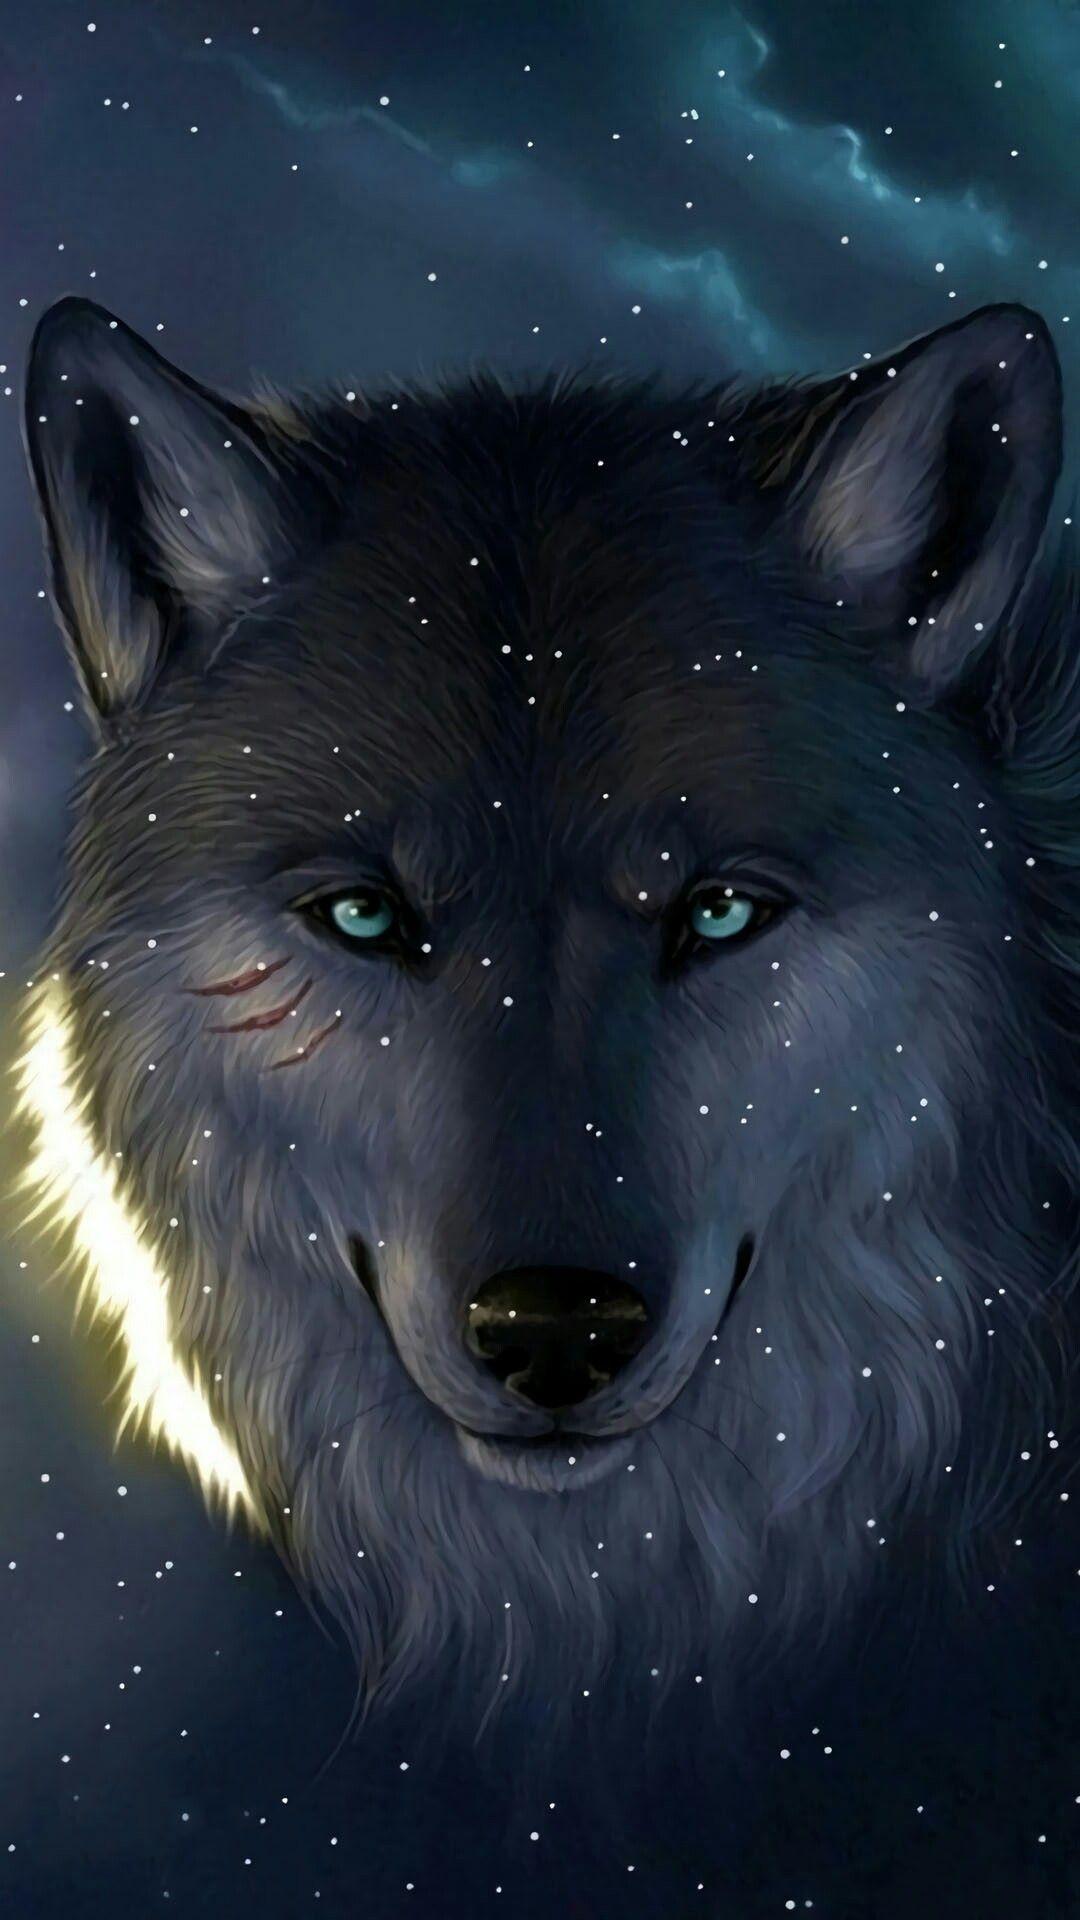 Pin By Matsmeerlo On Wolves Wolf Artwork Alpha Wolf Wolf Wallpaper